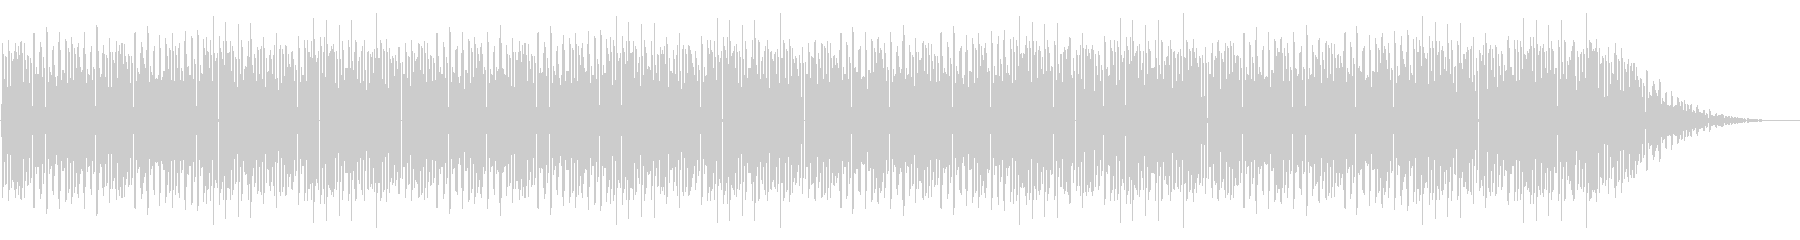 GB風アクションゲームのボス曲の未再生の波形